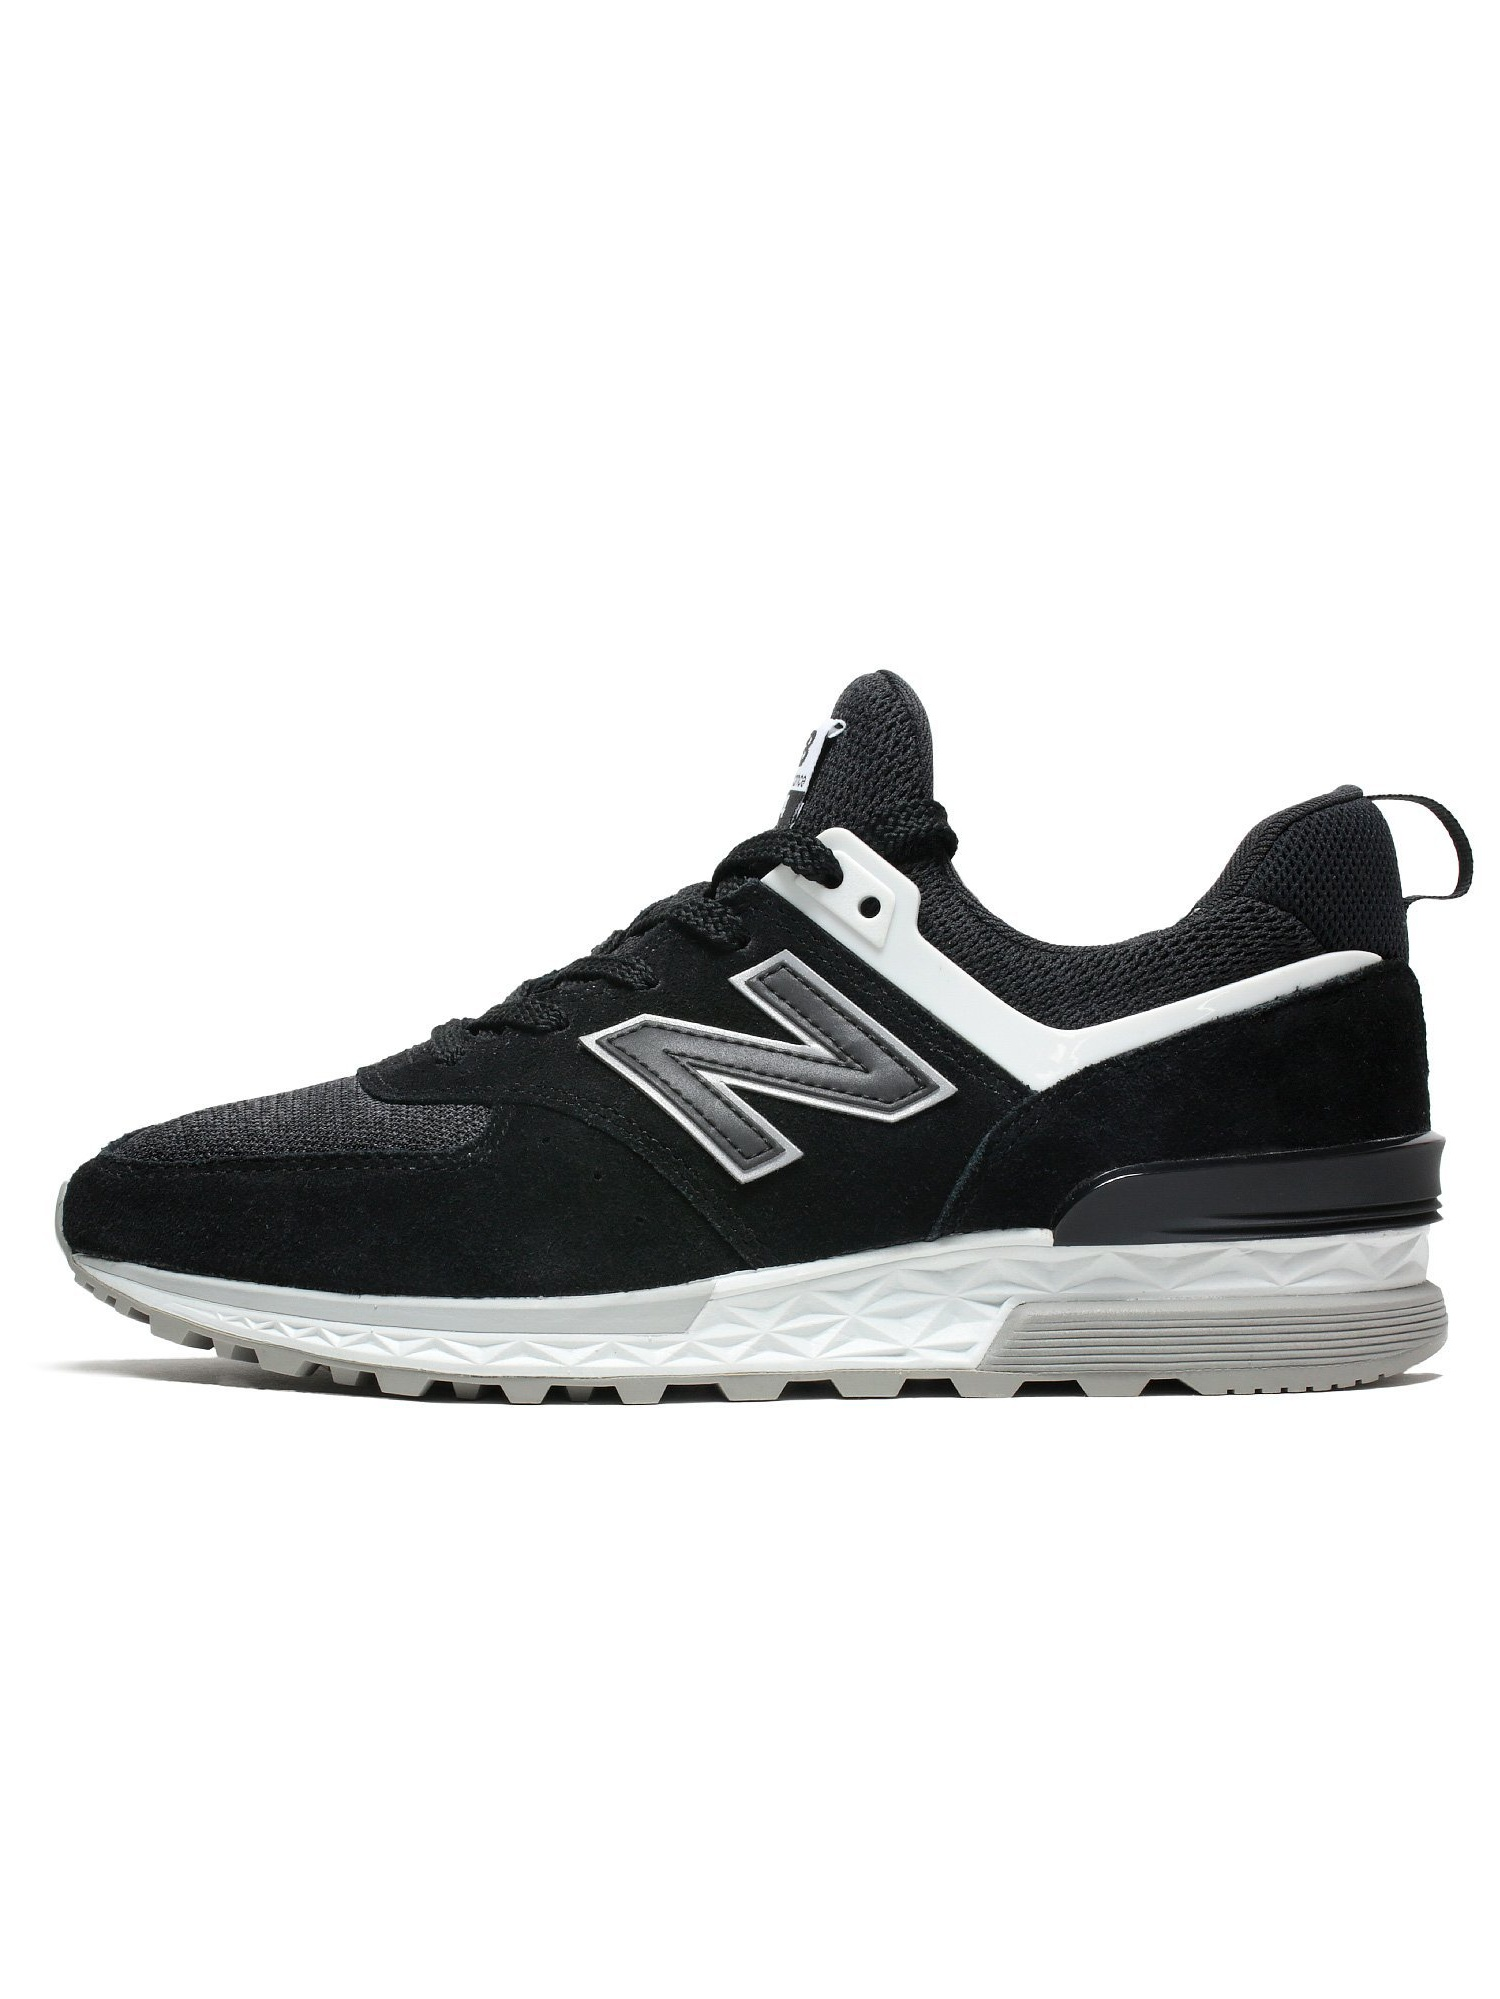 Mens New Balance 574 Fresh Foam Black Grey White MS574CC